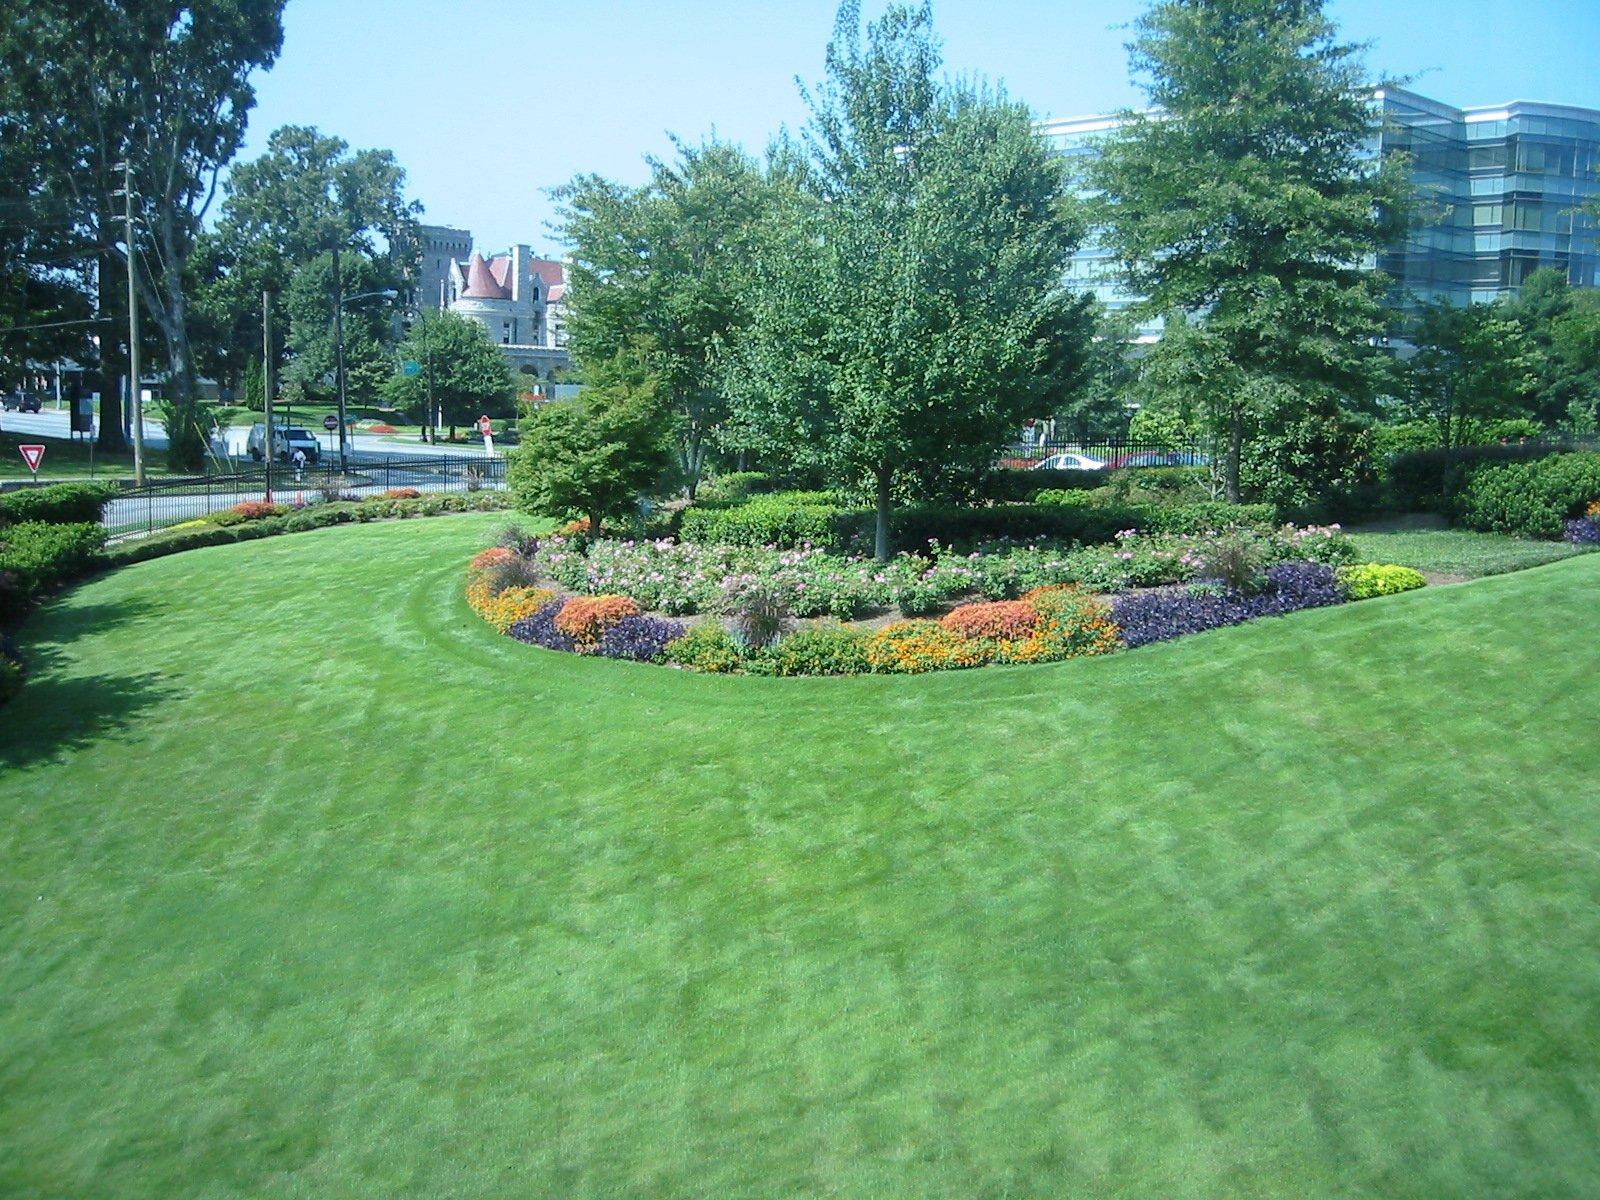 Commercial landscape maintenance full service landscape for Commercial landscape maintenance